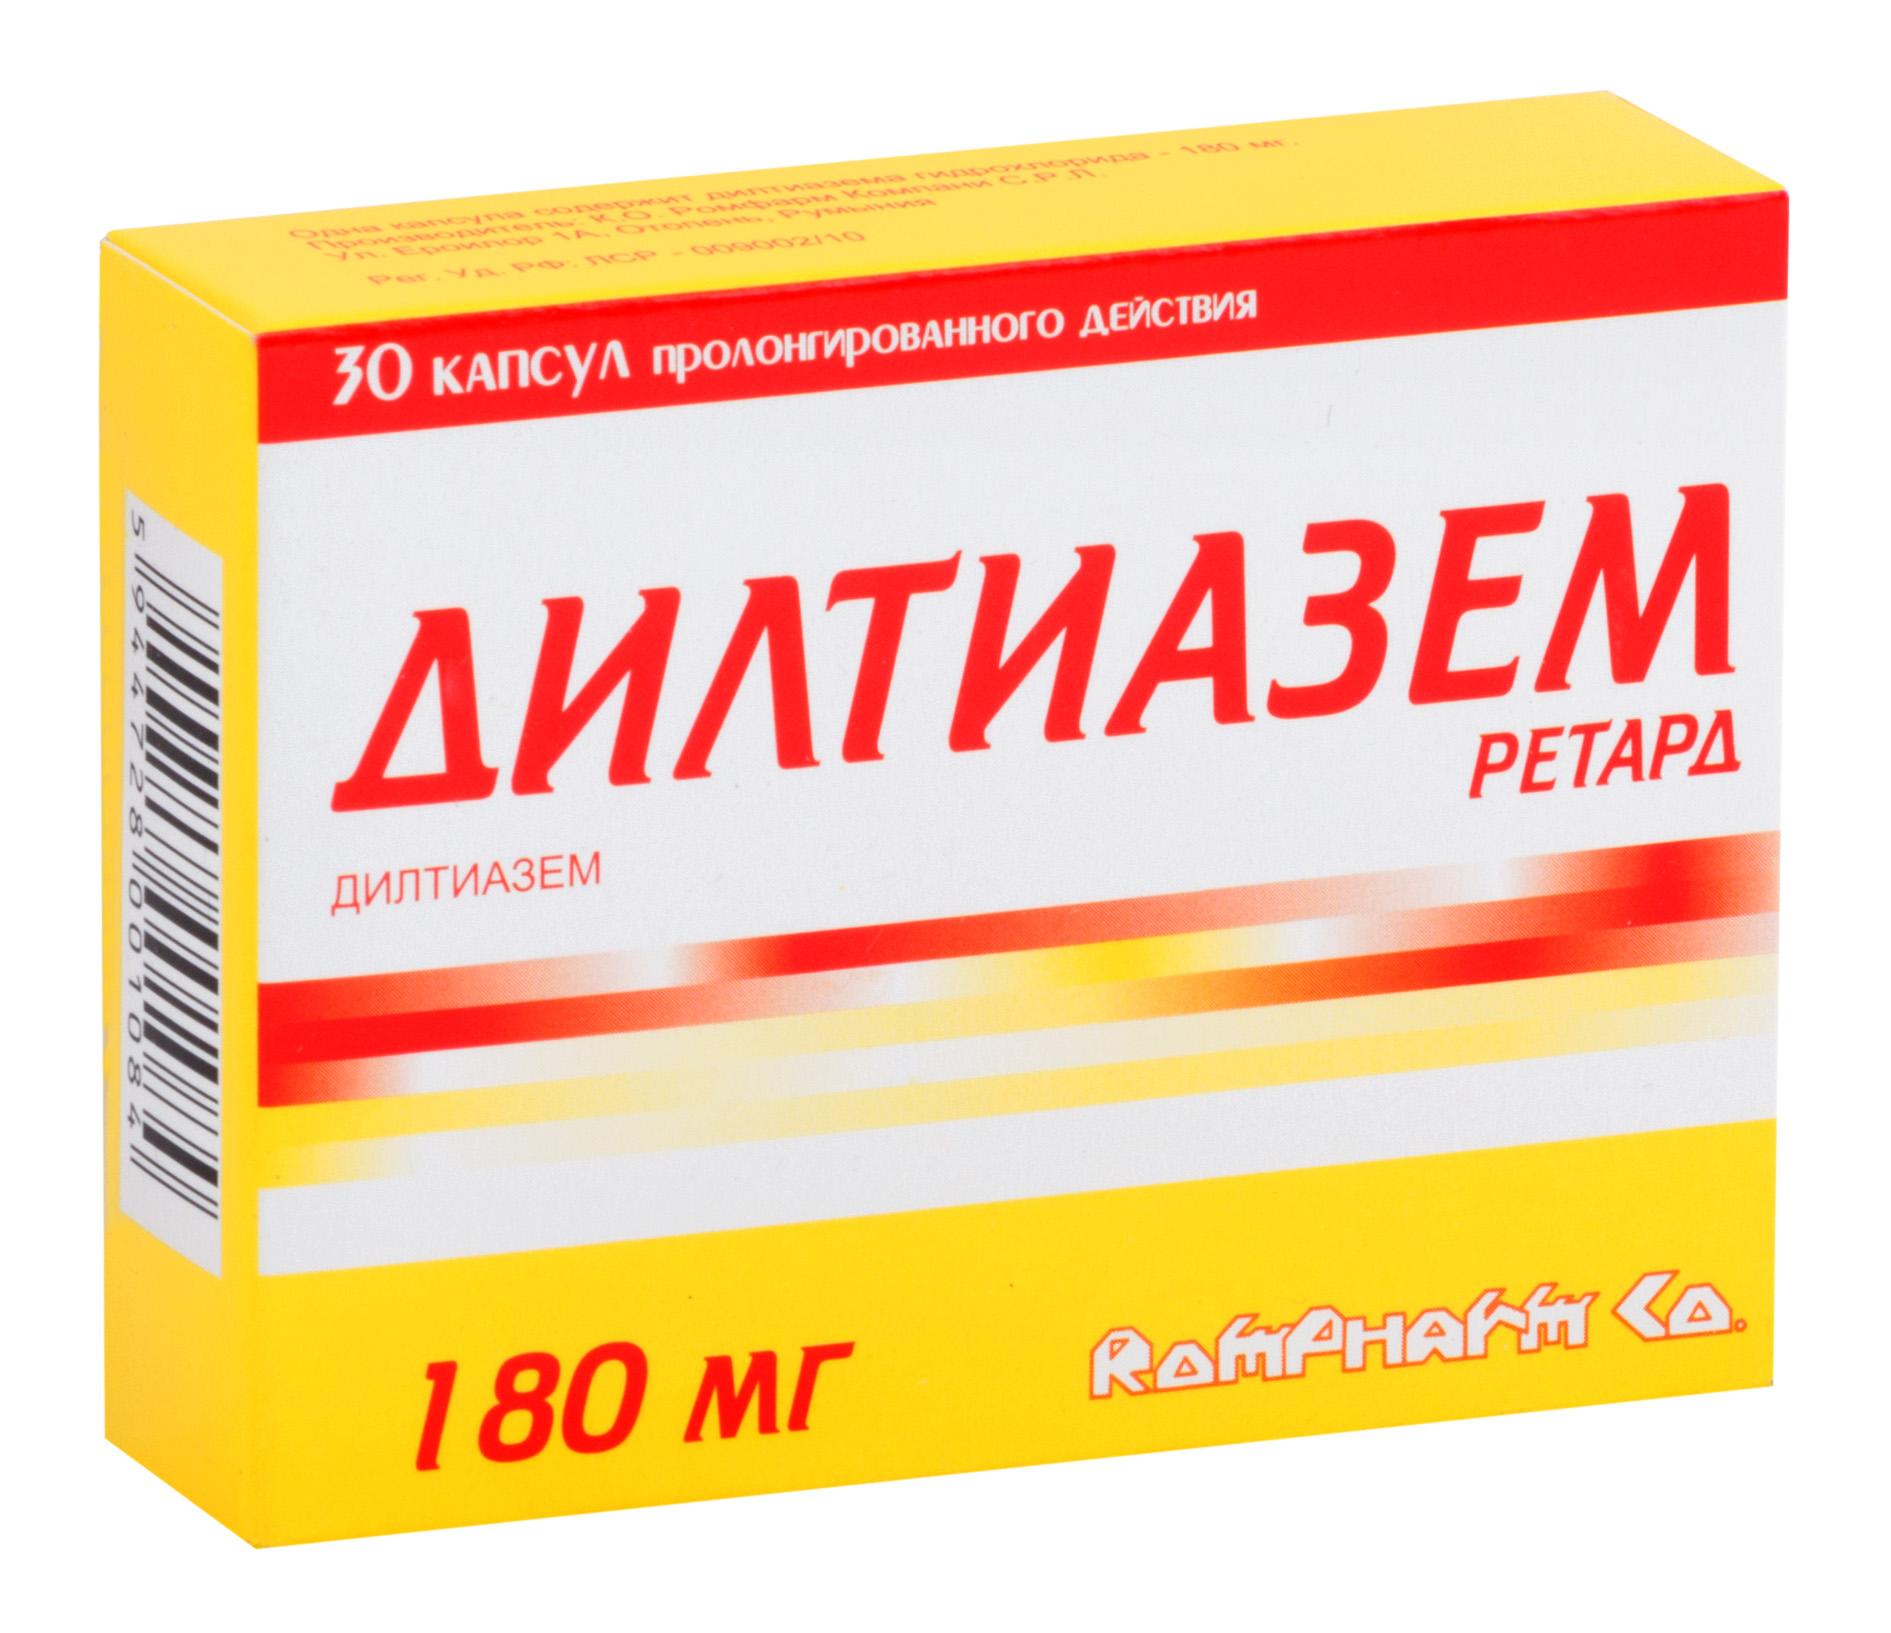 Дилтиазем ретард капс. пролонг. 180мг n30